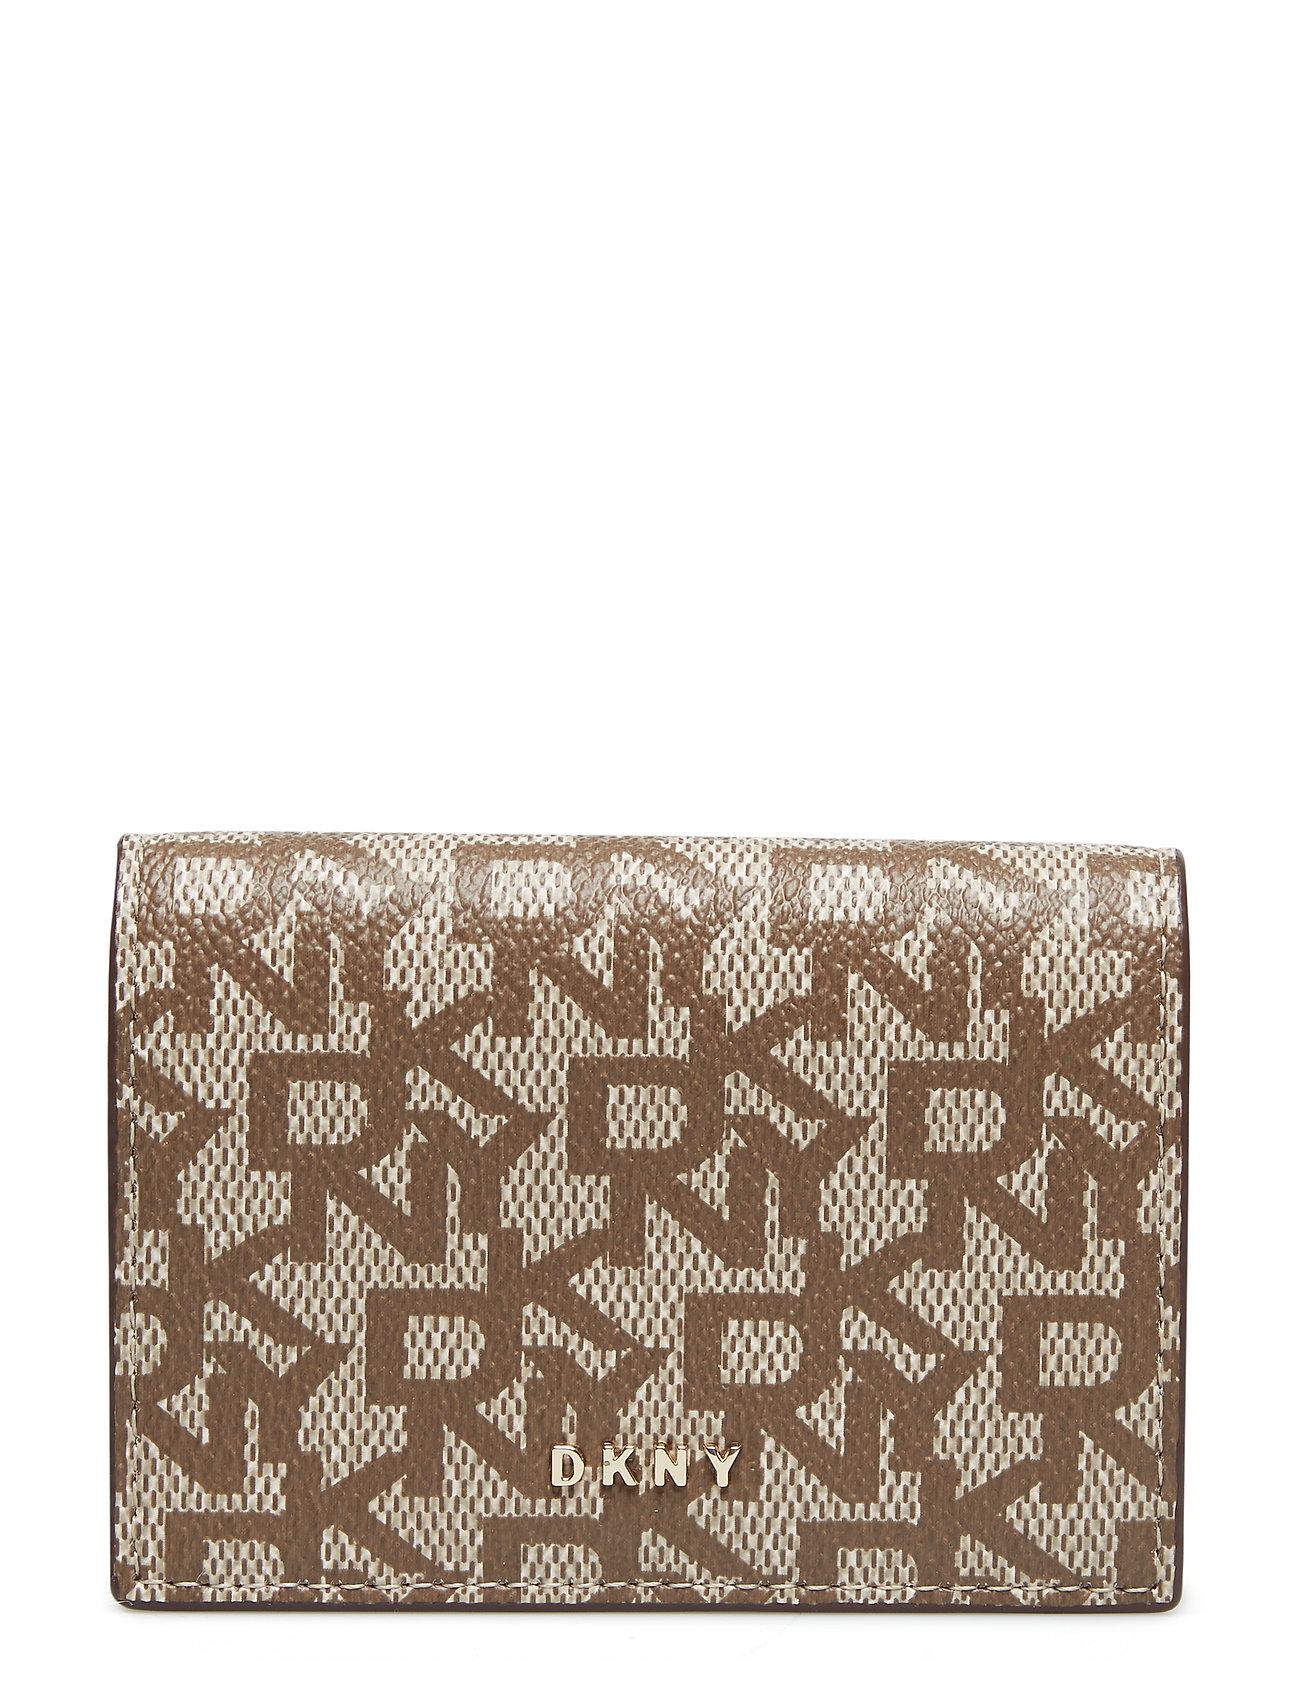 DKNY Bags SLG-BRYANT